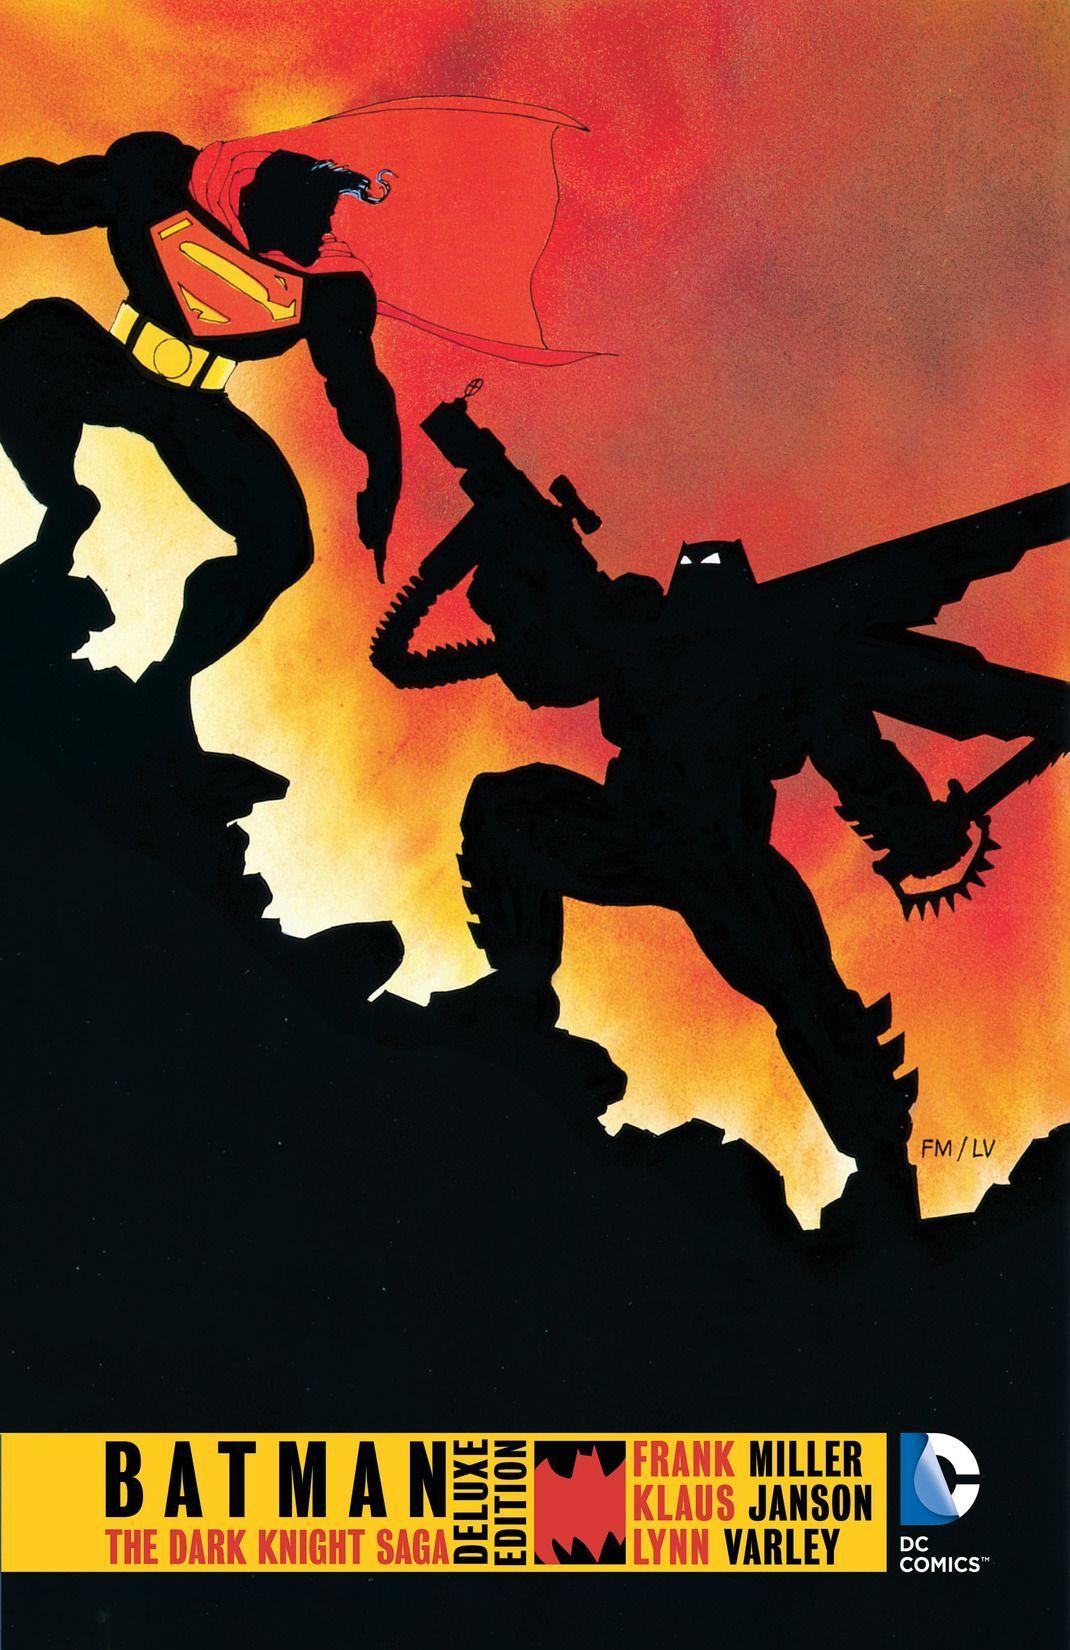 Batman The Dark Knight Saga Deluxe Edition Batman The Dark